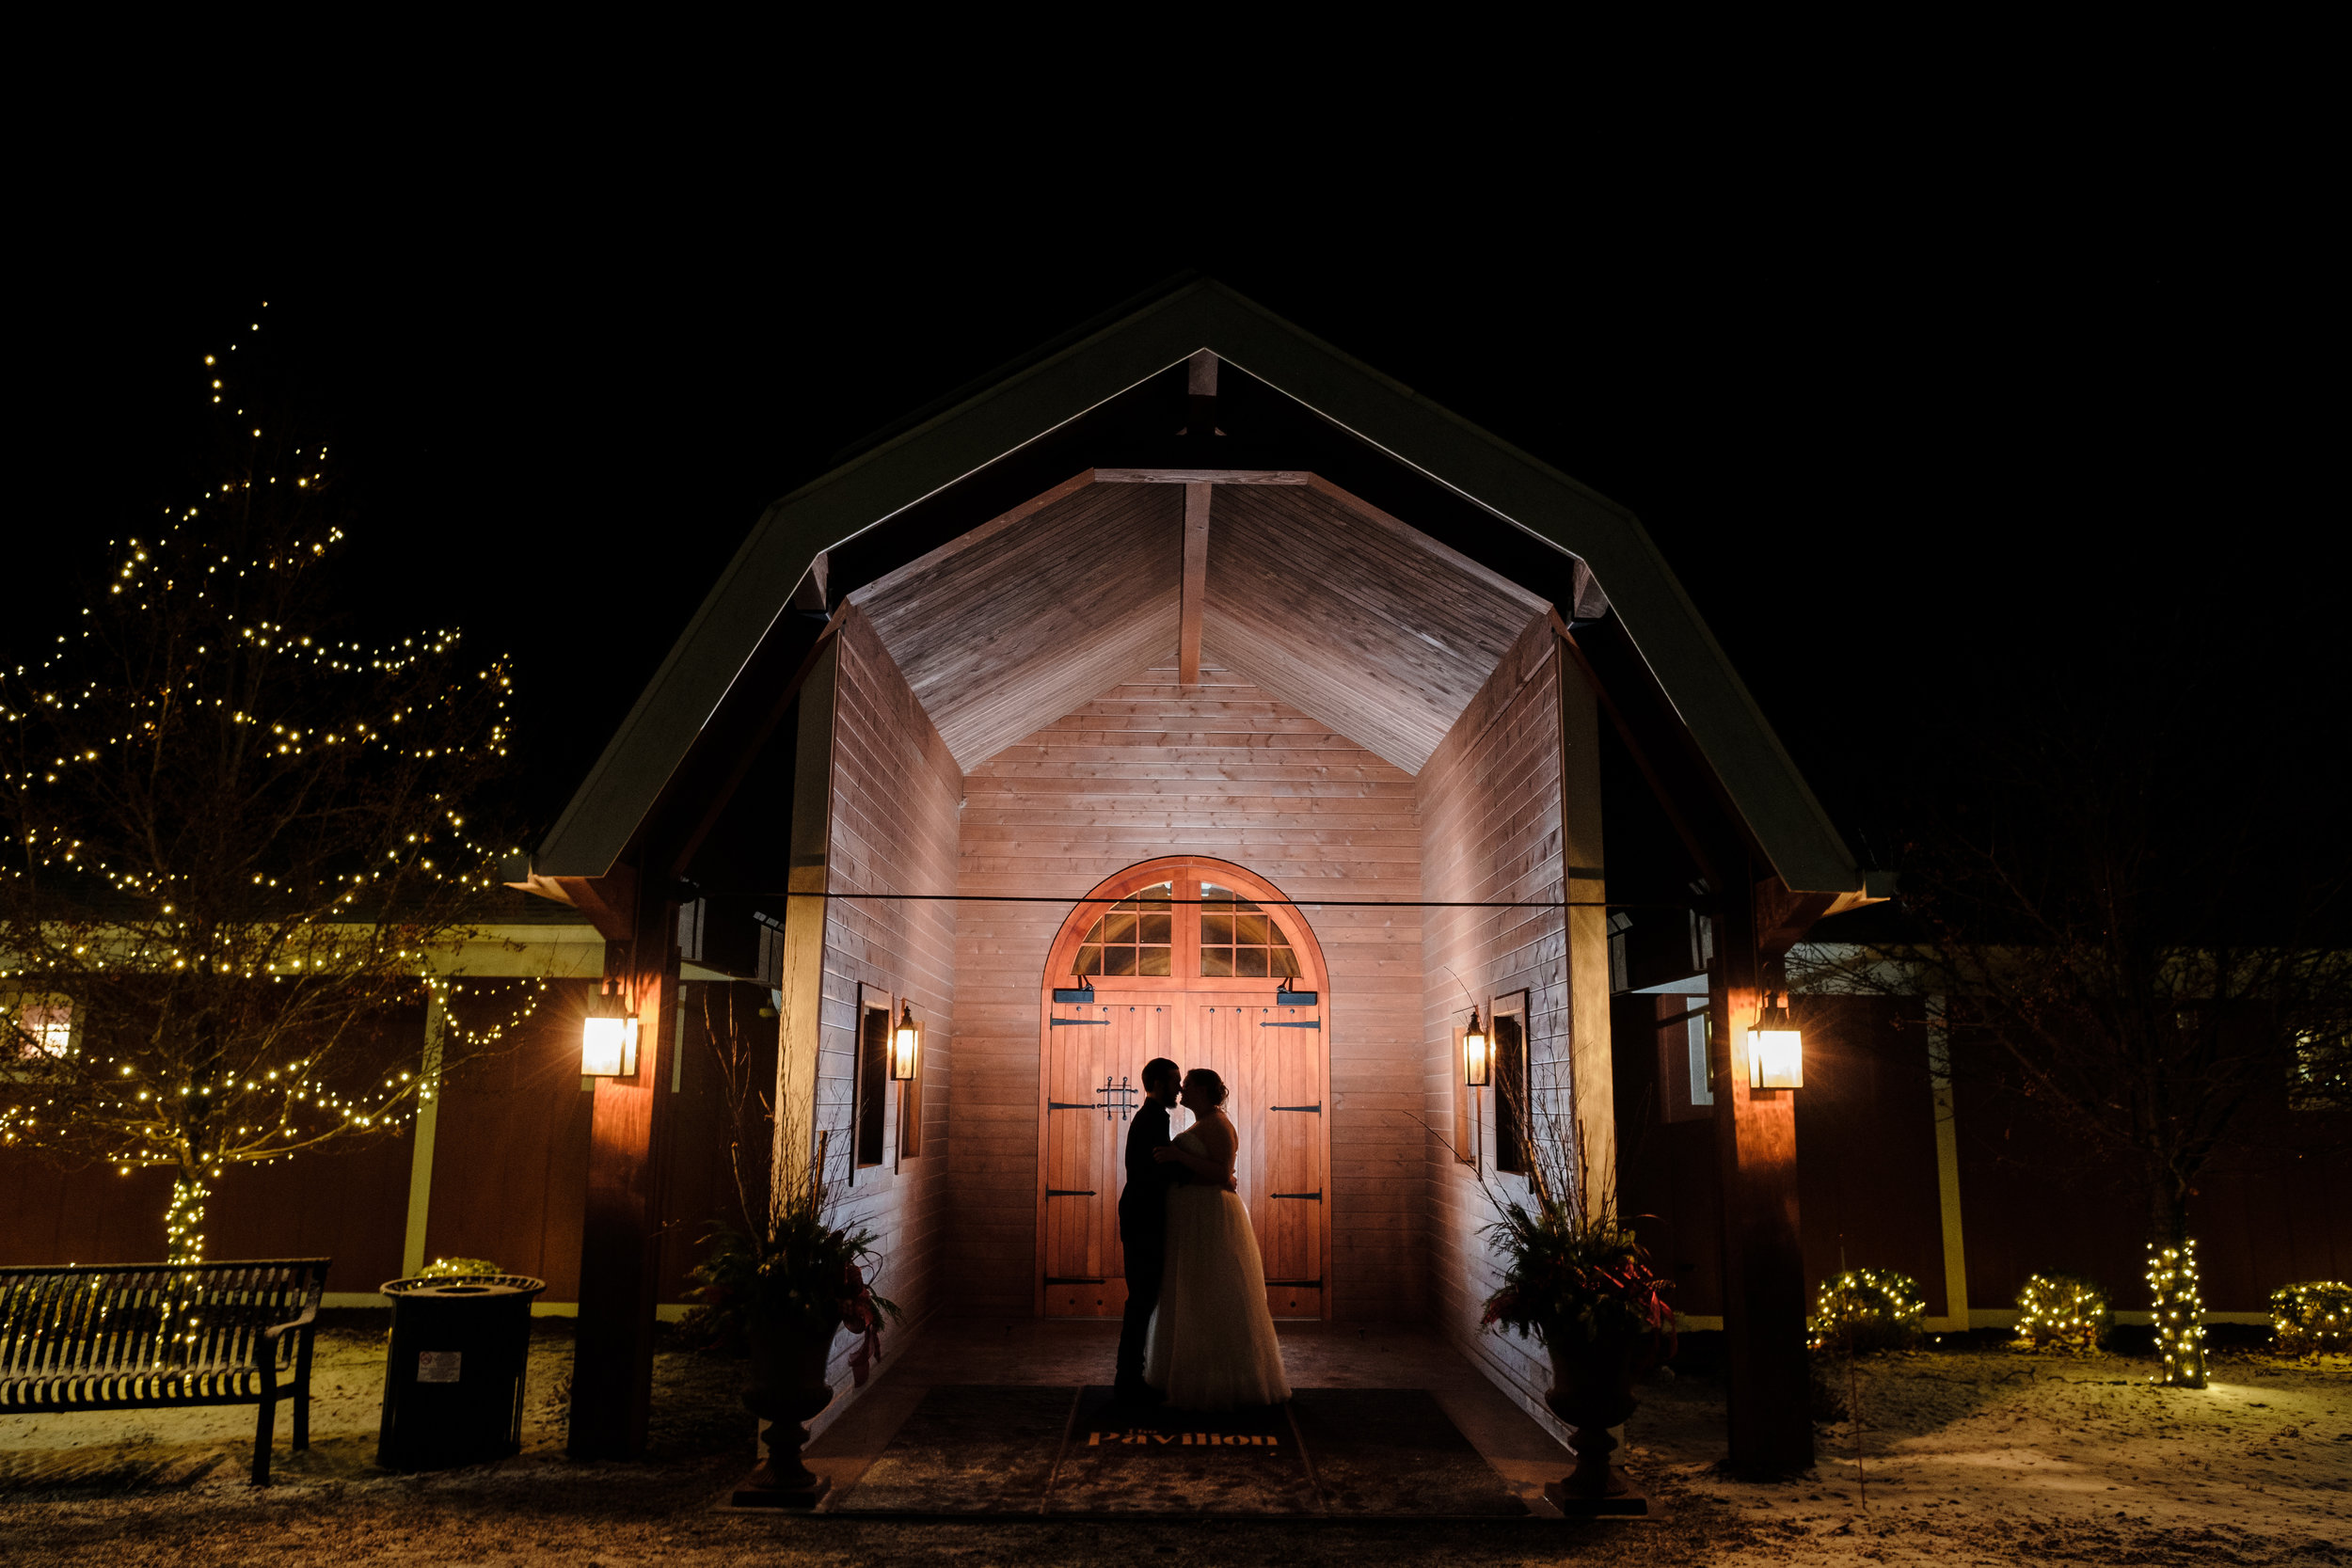 18-12-28 Corinne-Henry-Pavilion-Wedding-635.jpg